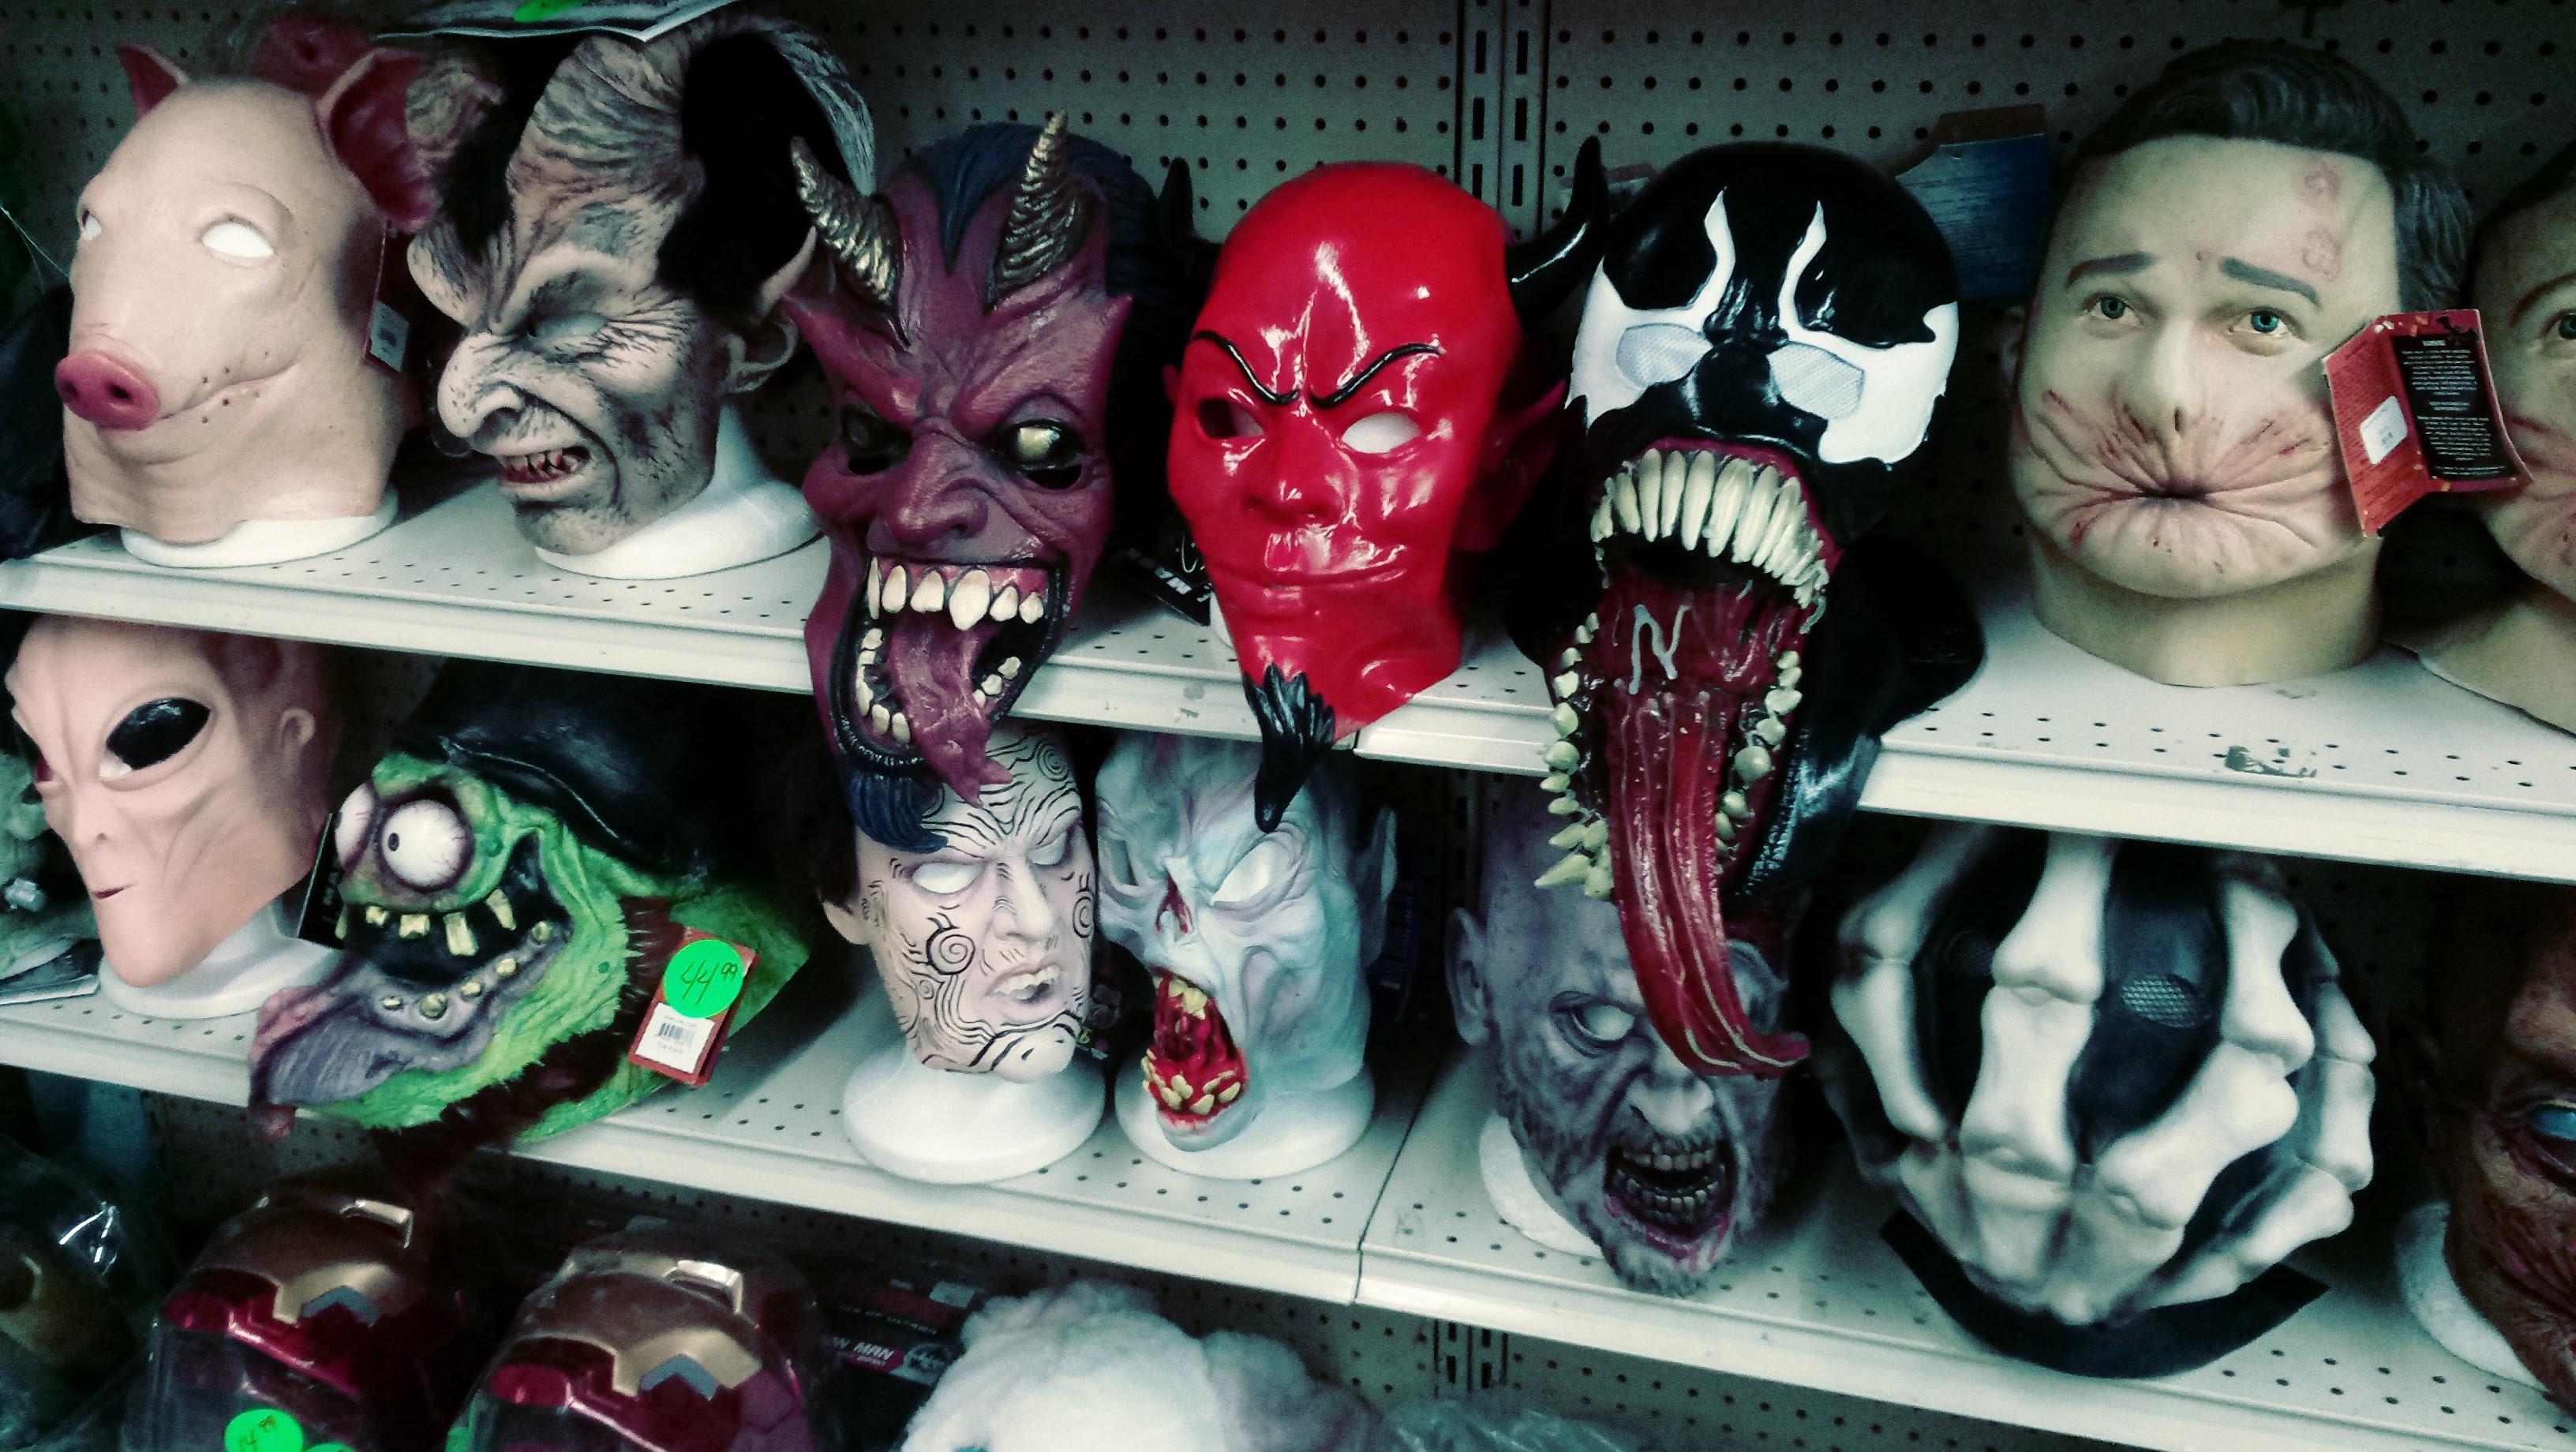 nick nackery nosferatu screaming spawn venom satan devil pig ratfink buttface masks